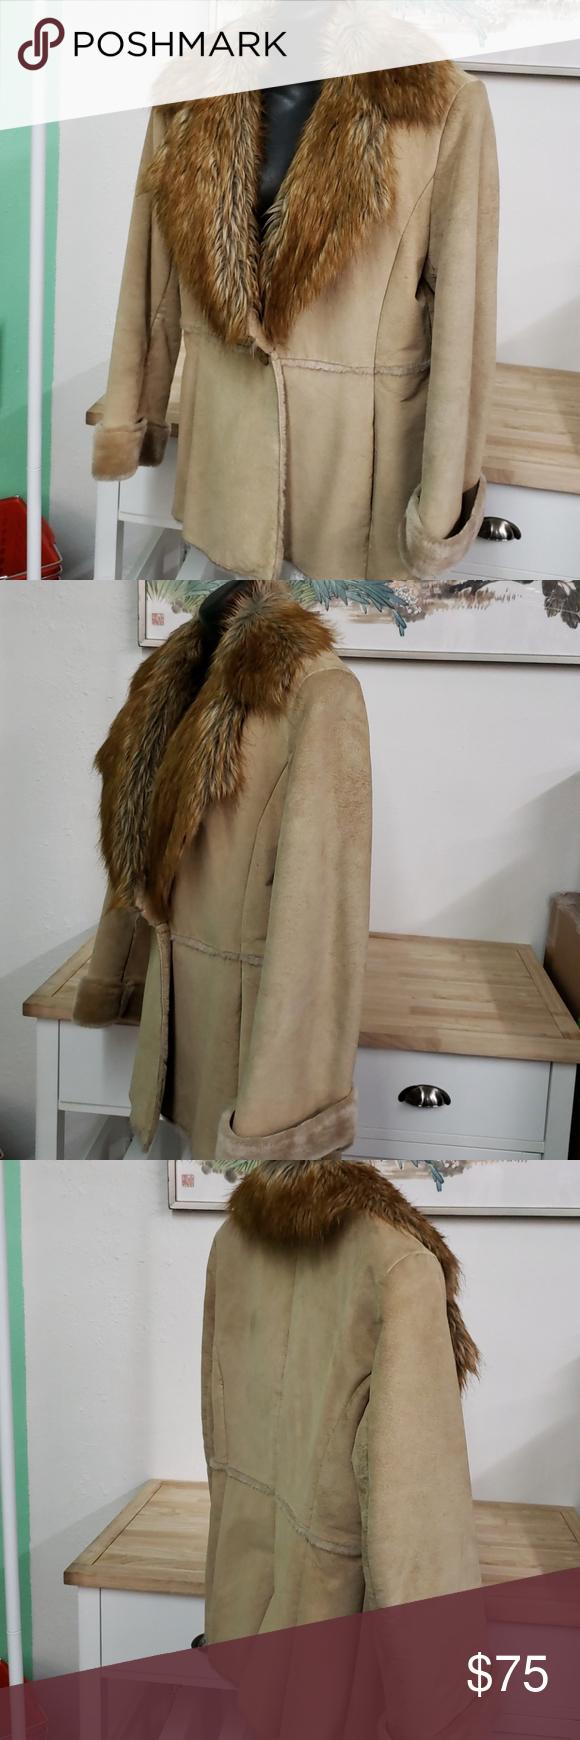 Guess leather jacket tan medium Beautiful gently used tan